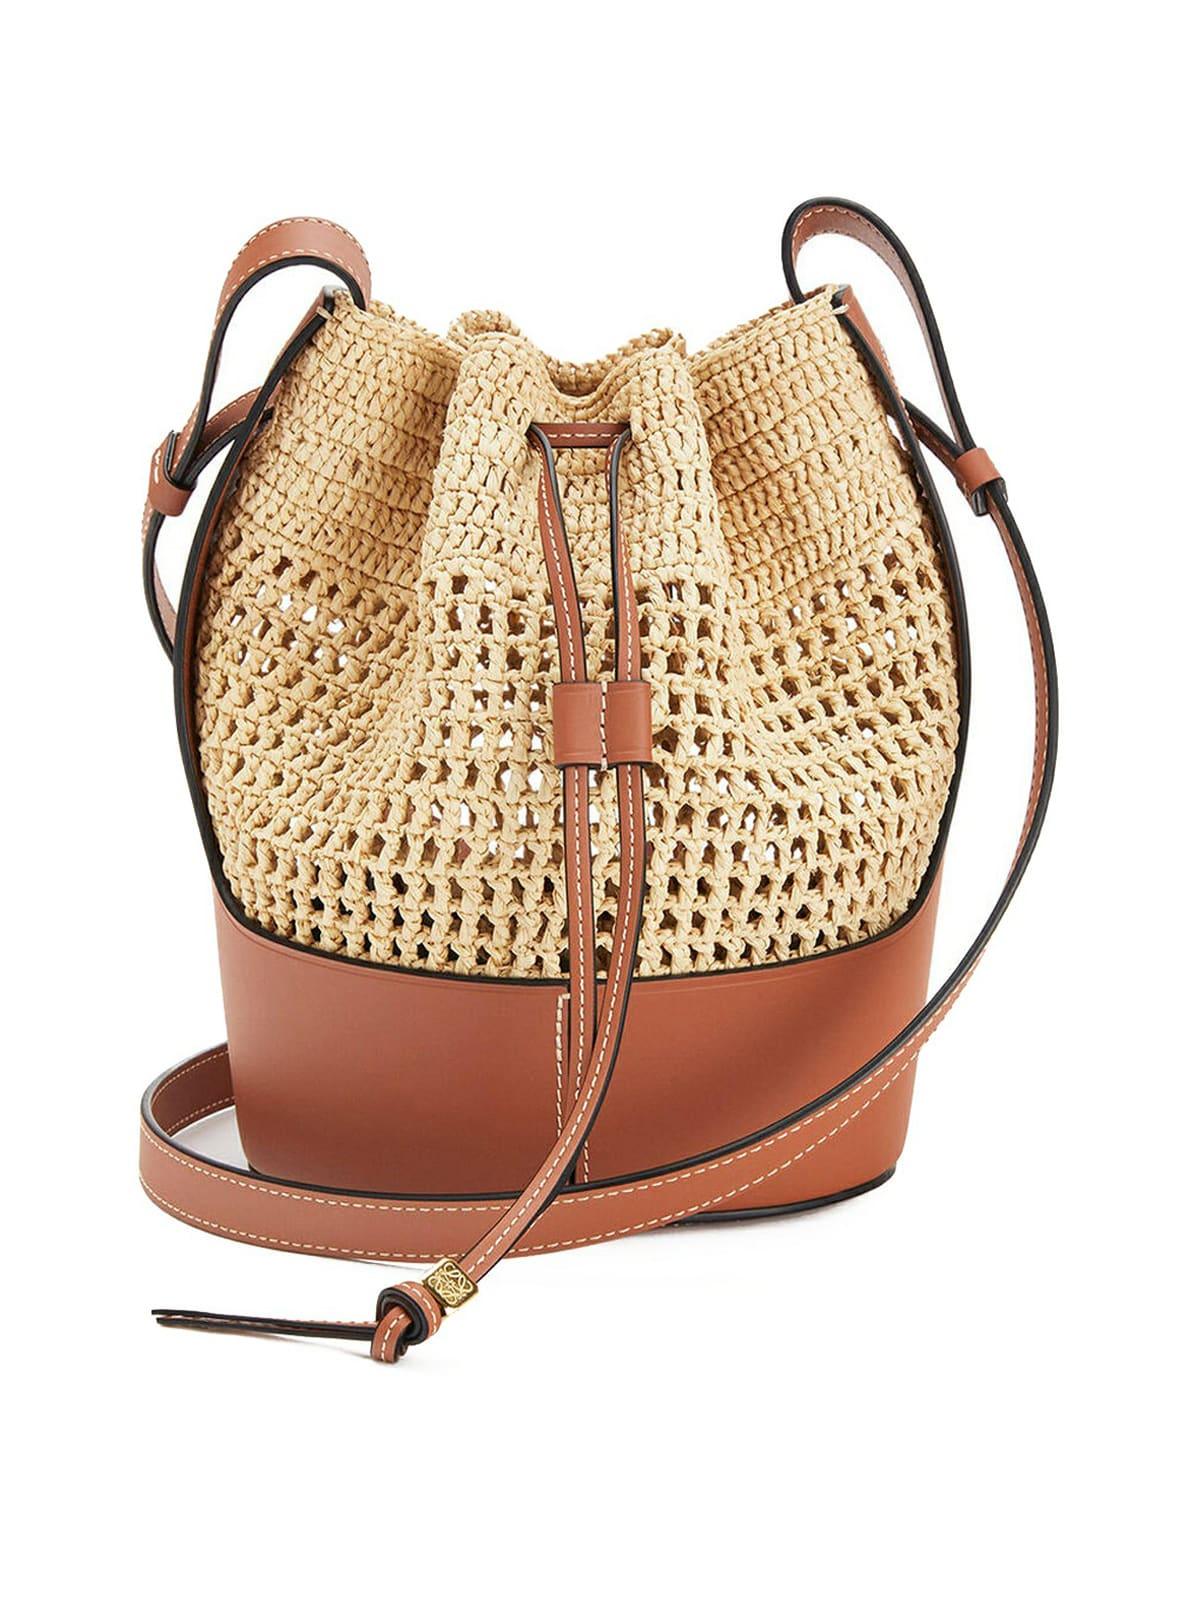 Loewe Leathers BALOON SMALL BAG